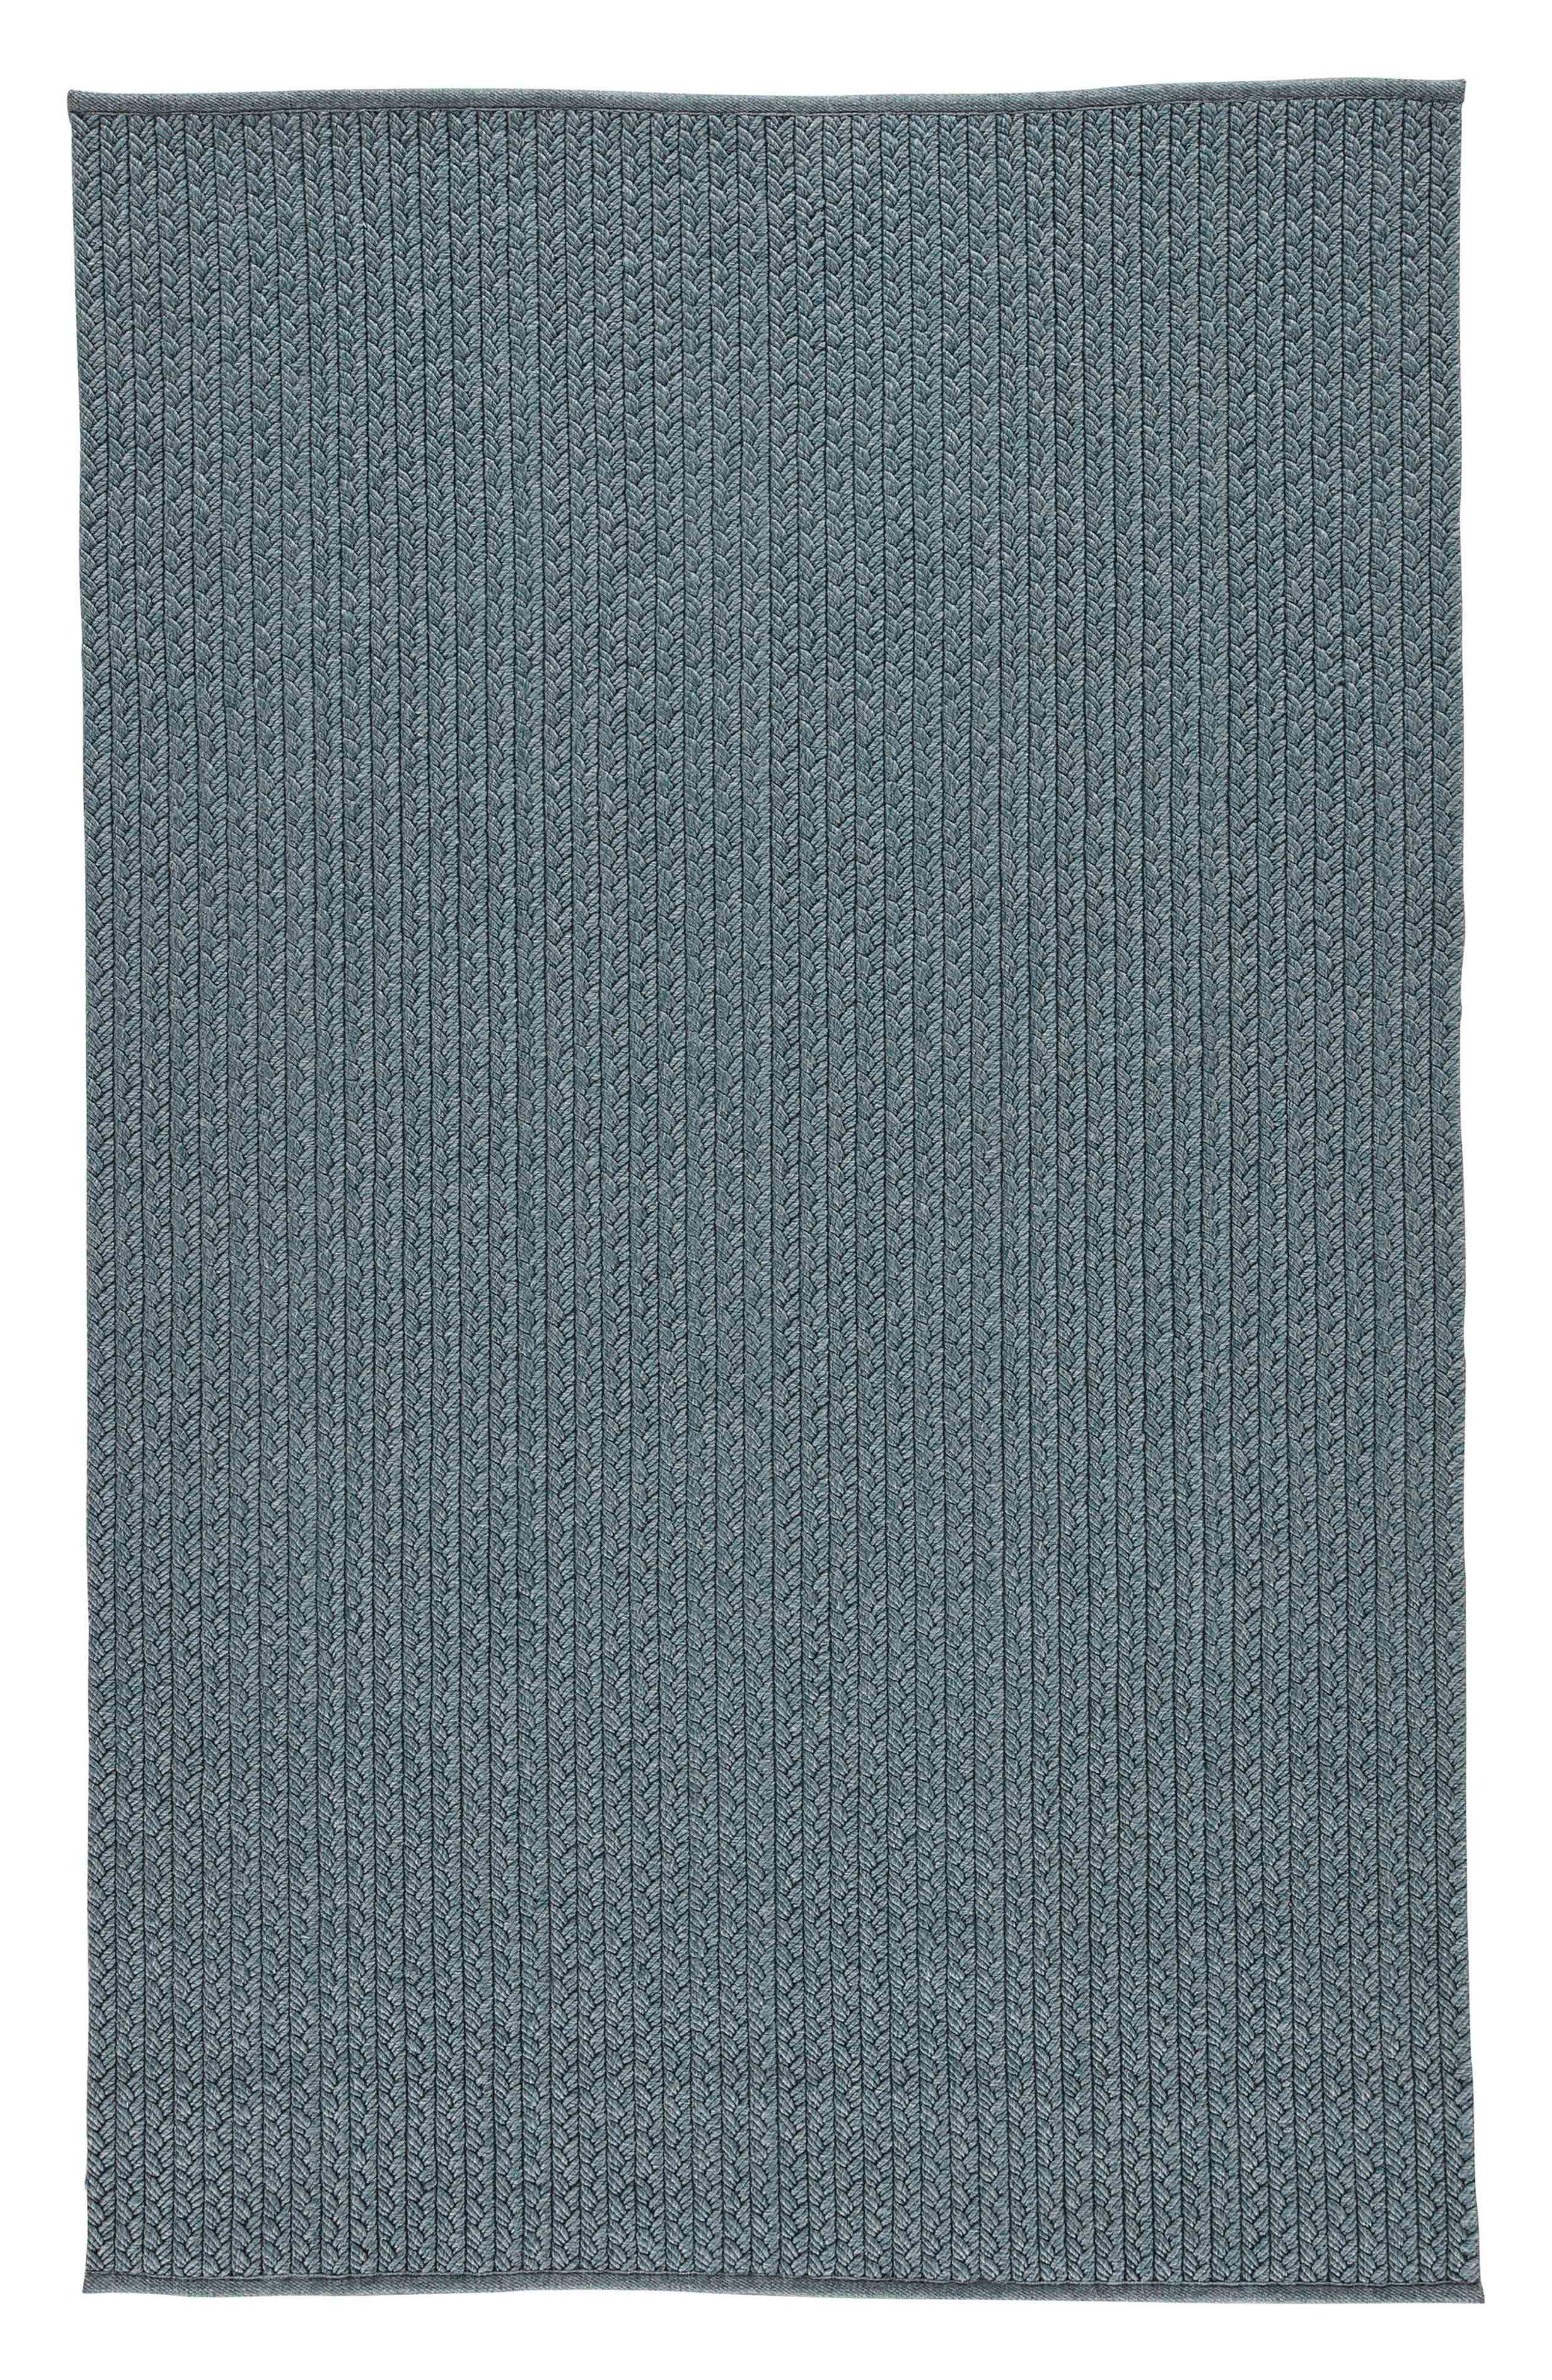 JAIPUR,                             Sedona Area Rug,                             Main thumbnail 1, color,                             DARK GRAY